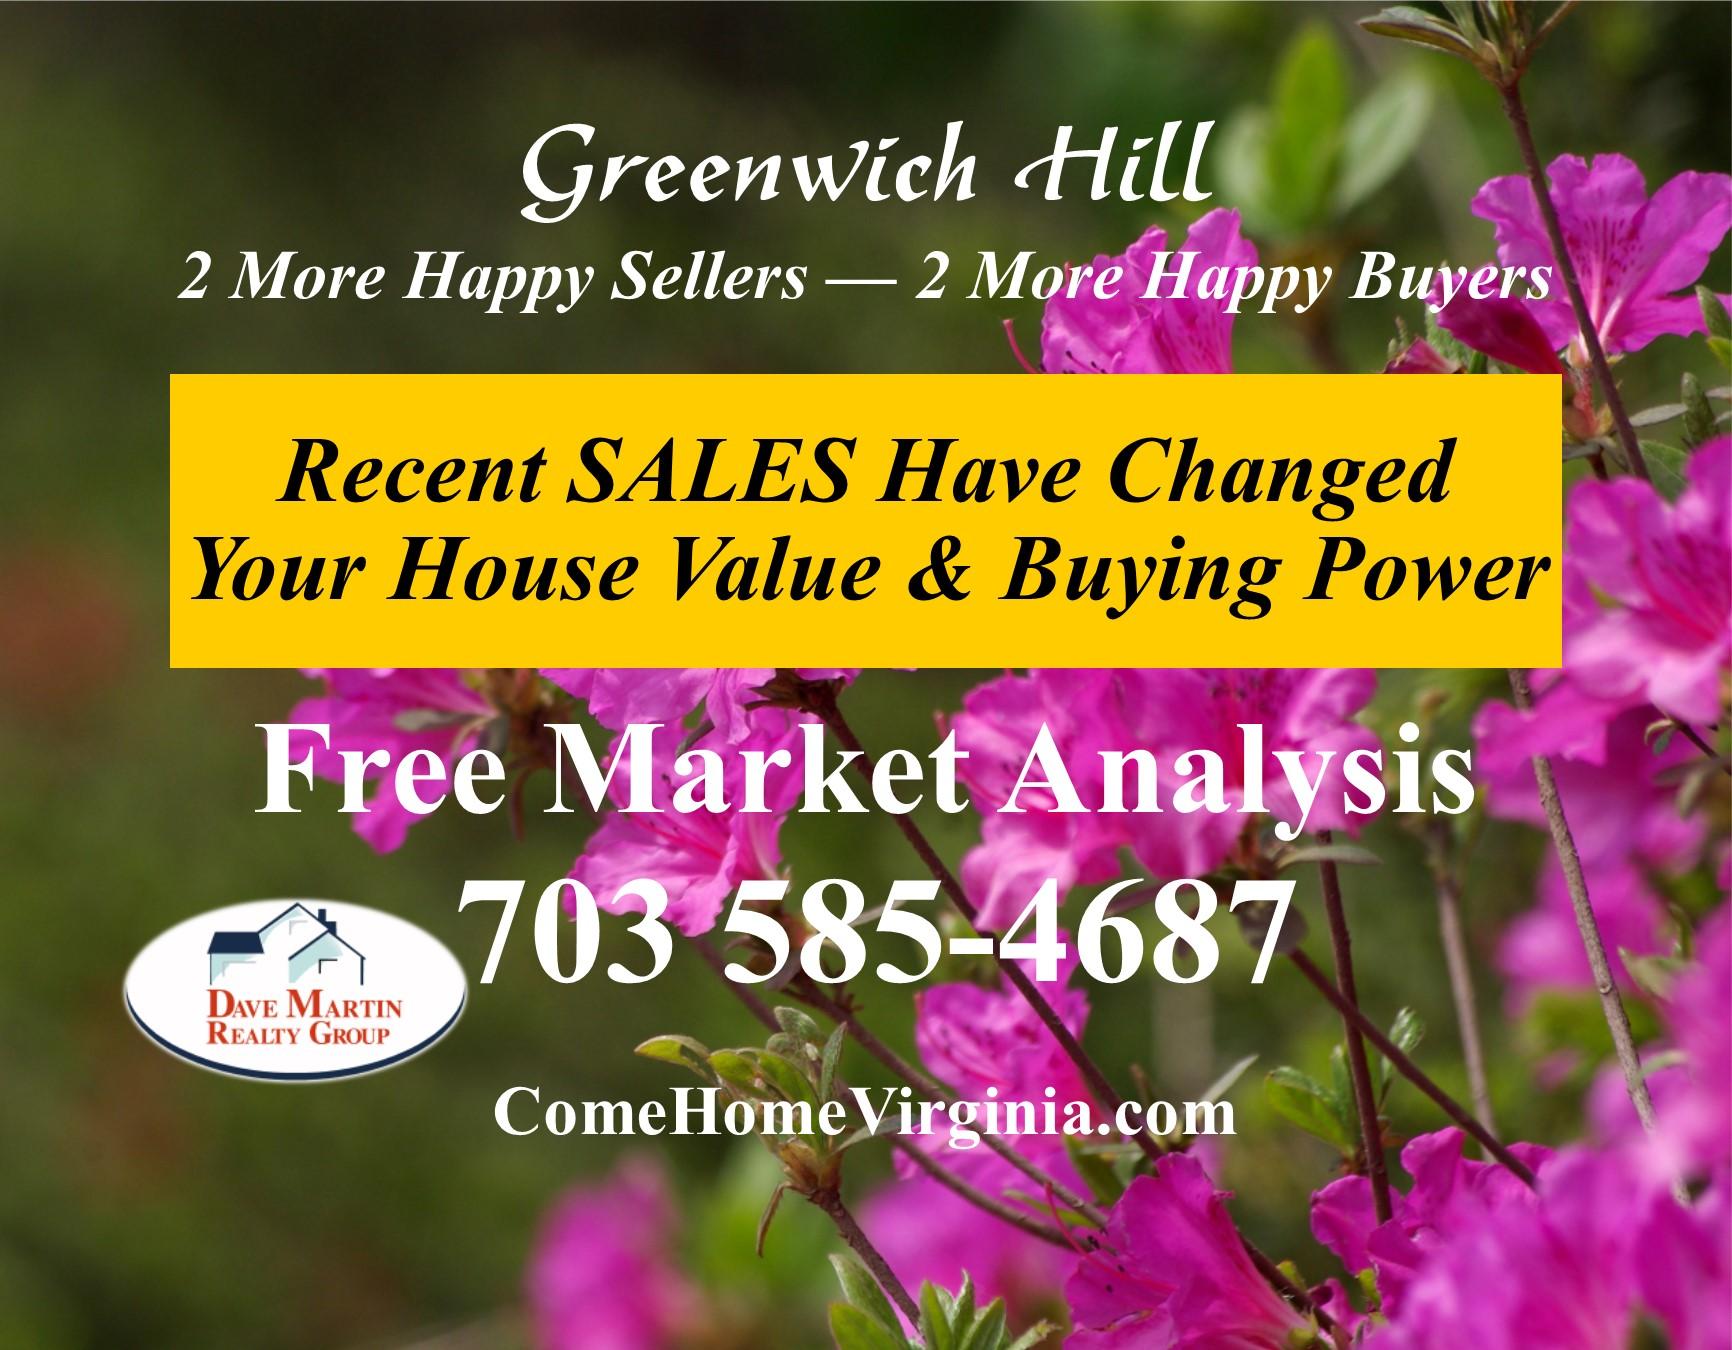 Real Estate Expert Greenwich Hill Woodbridge Va 22191 Home Buyer Guaranteed Savings